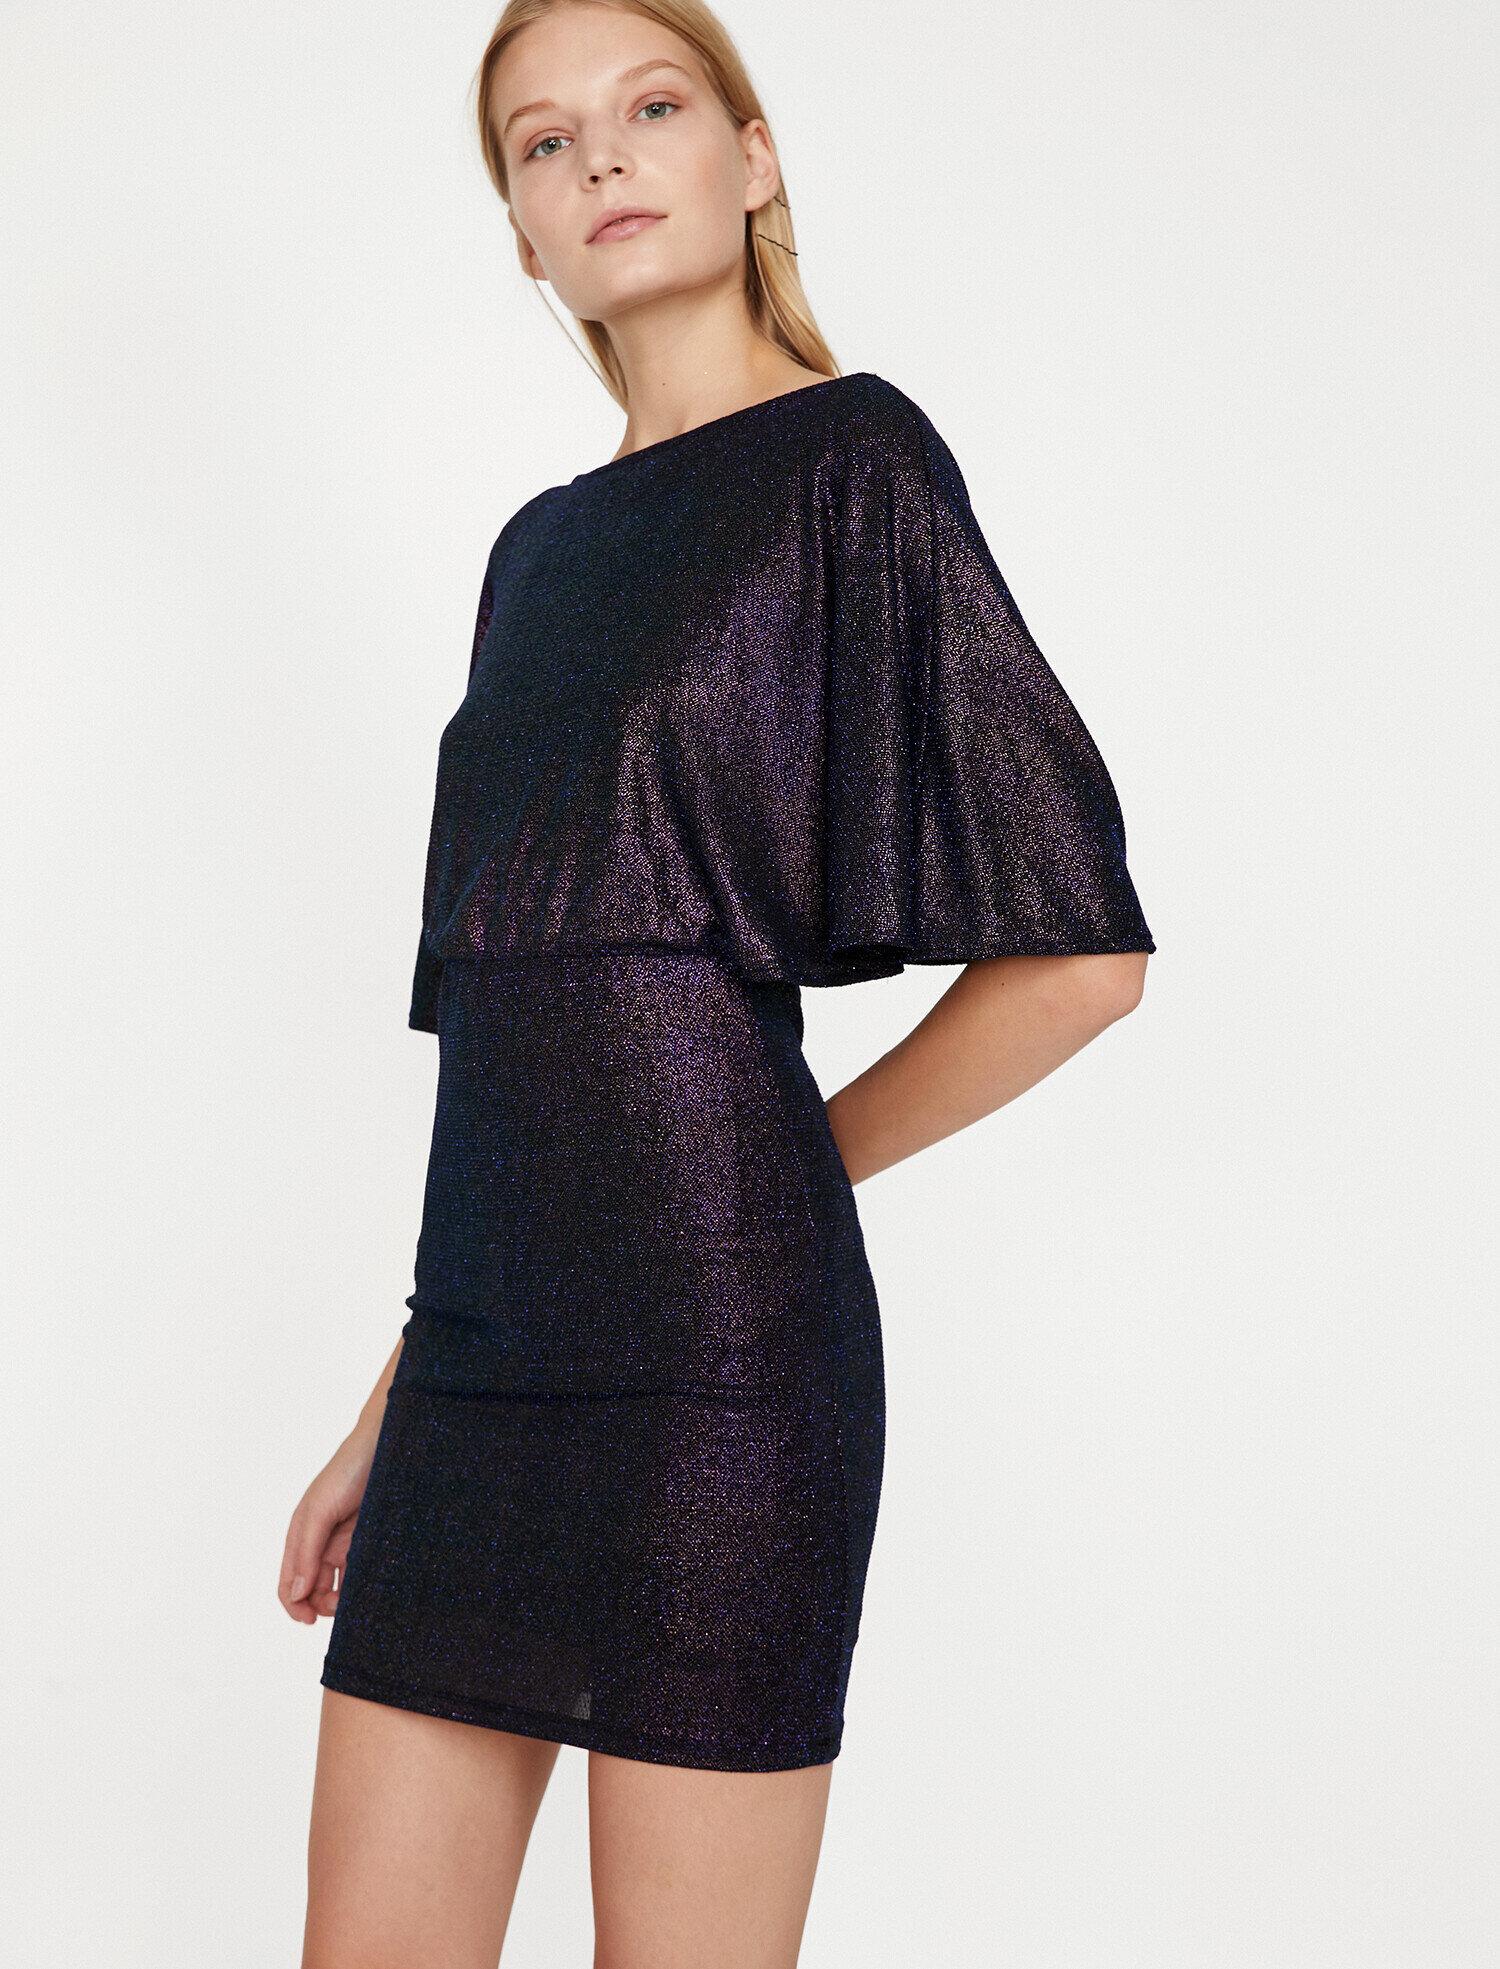 1ffd54a874751 Multi Women Shimmer Detailed Dress 9KAK84949FK913 | Koton